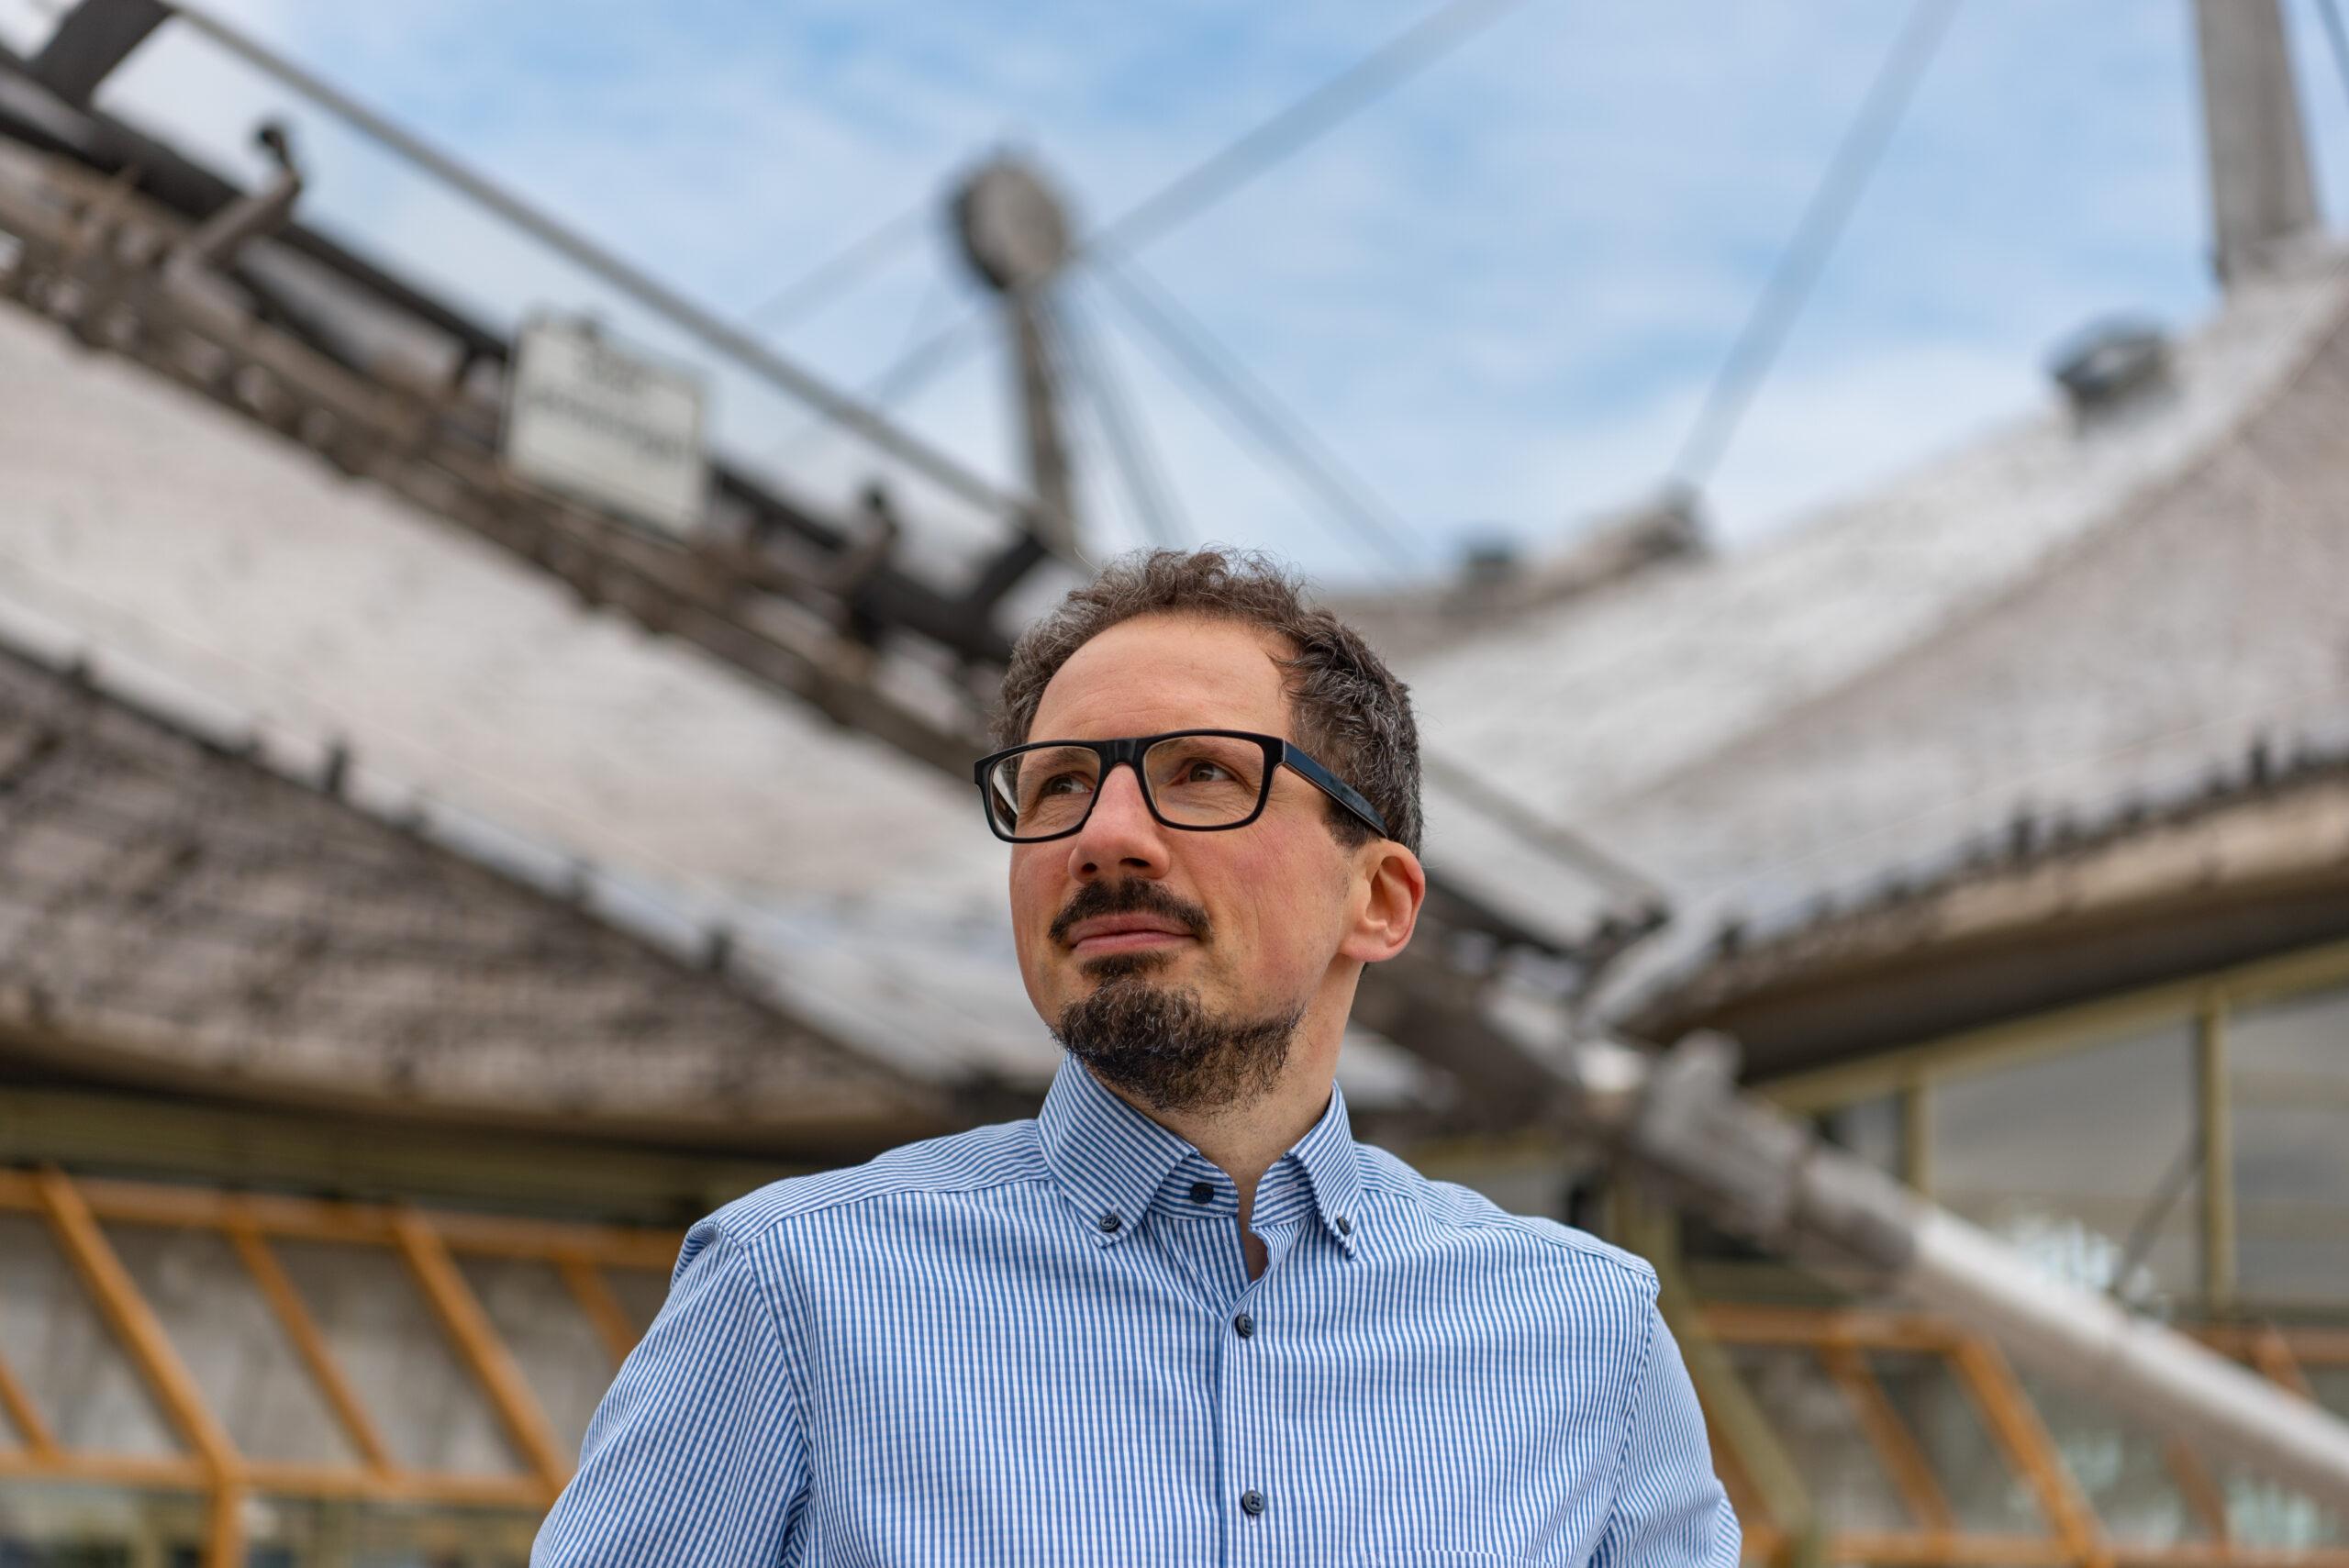 Bernhard Goodwin vor dem Zeltdach der Olympiahalle